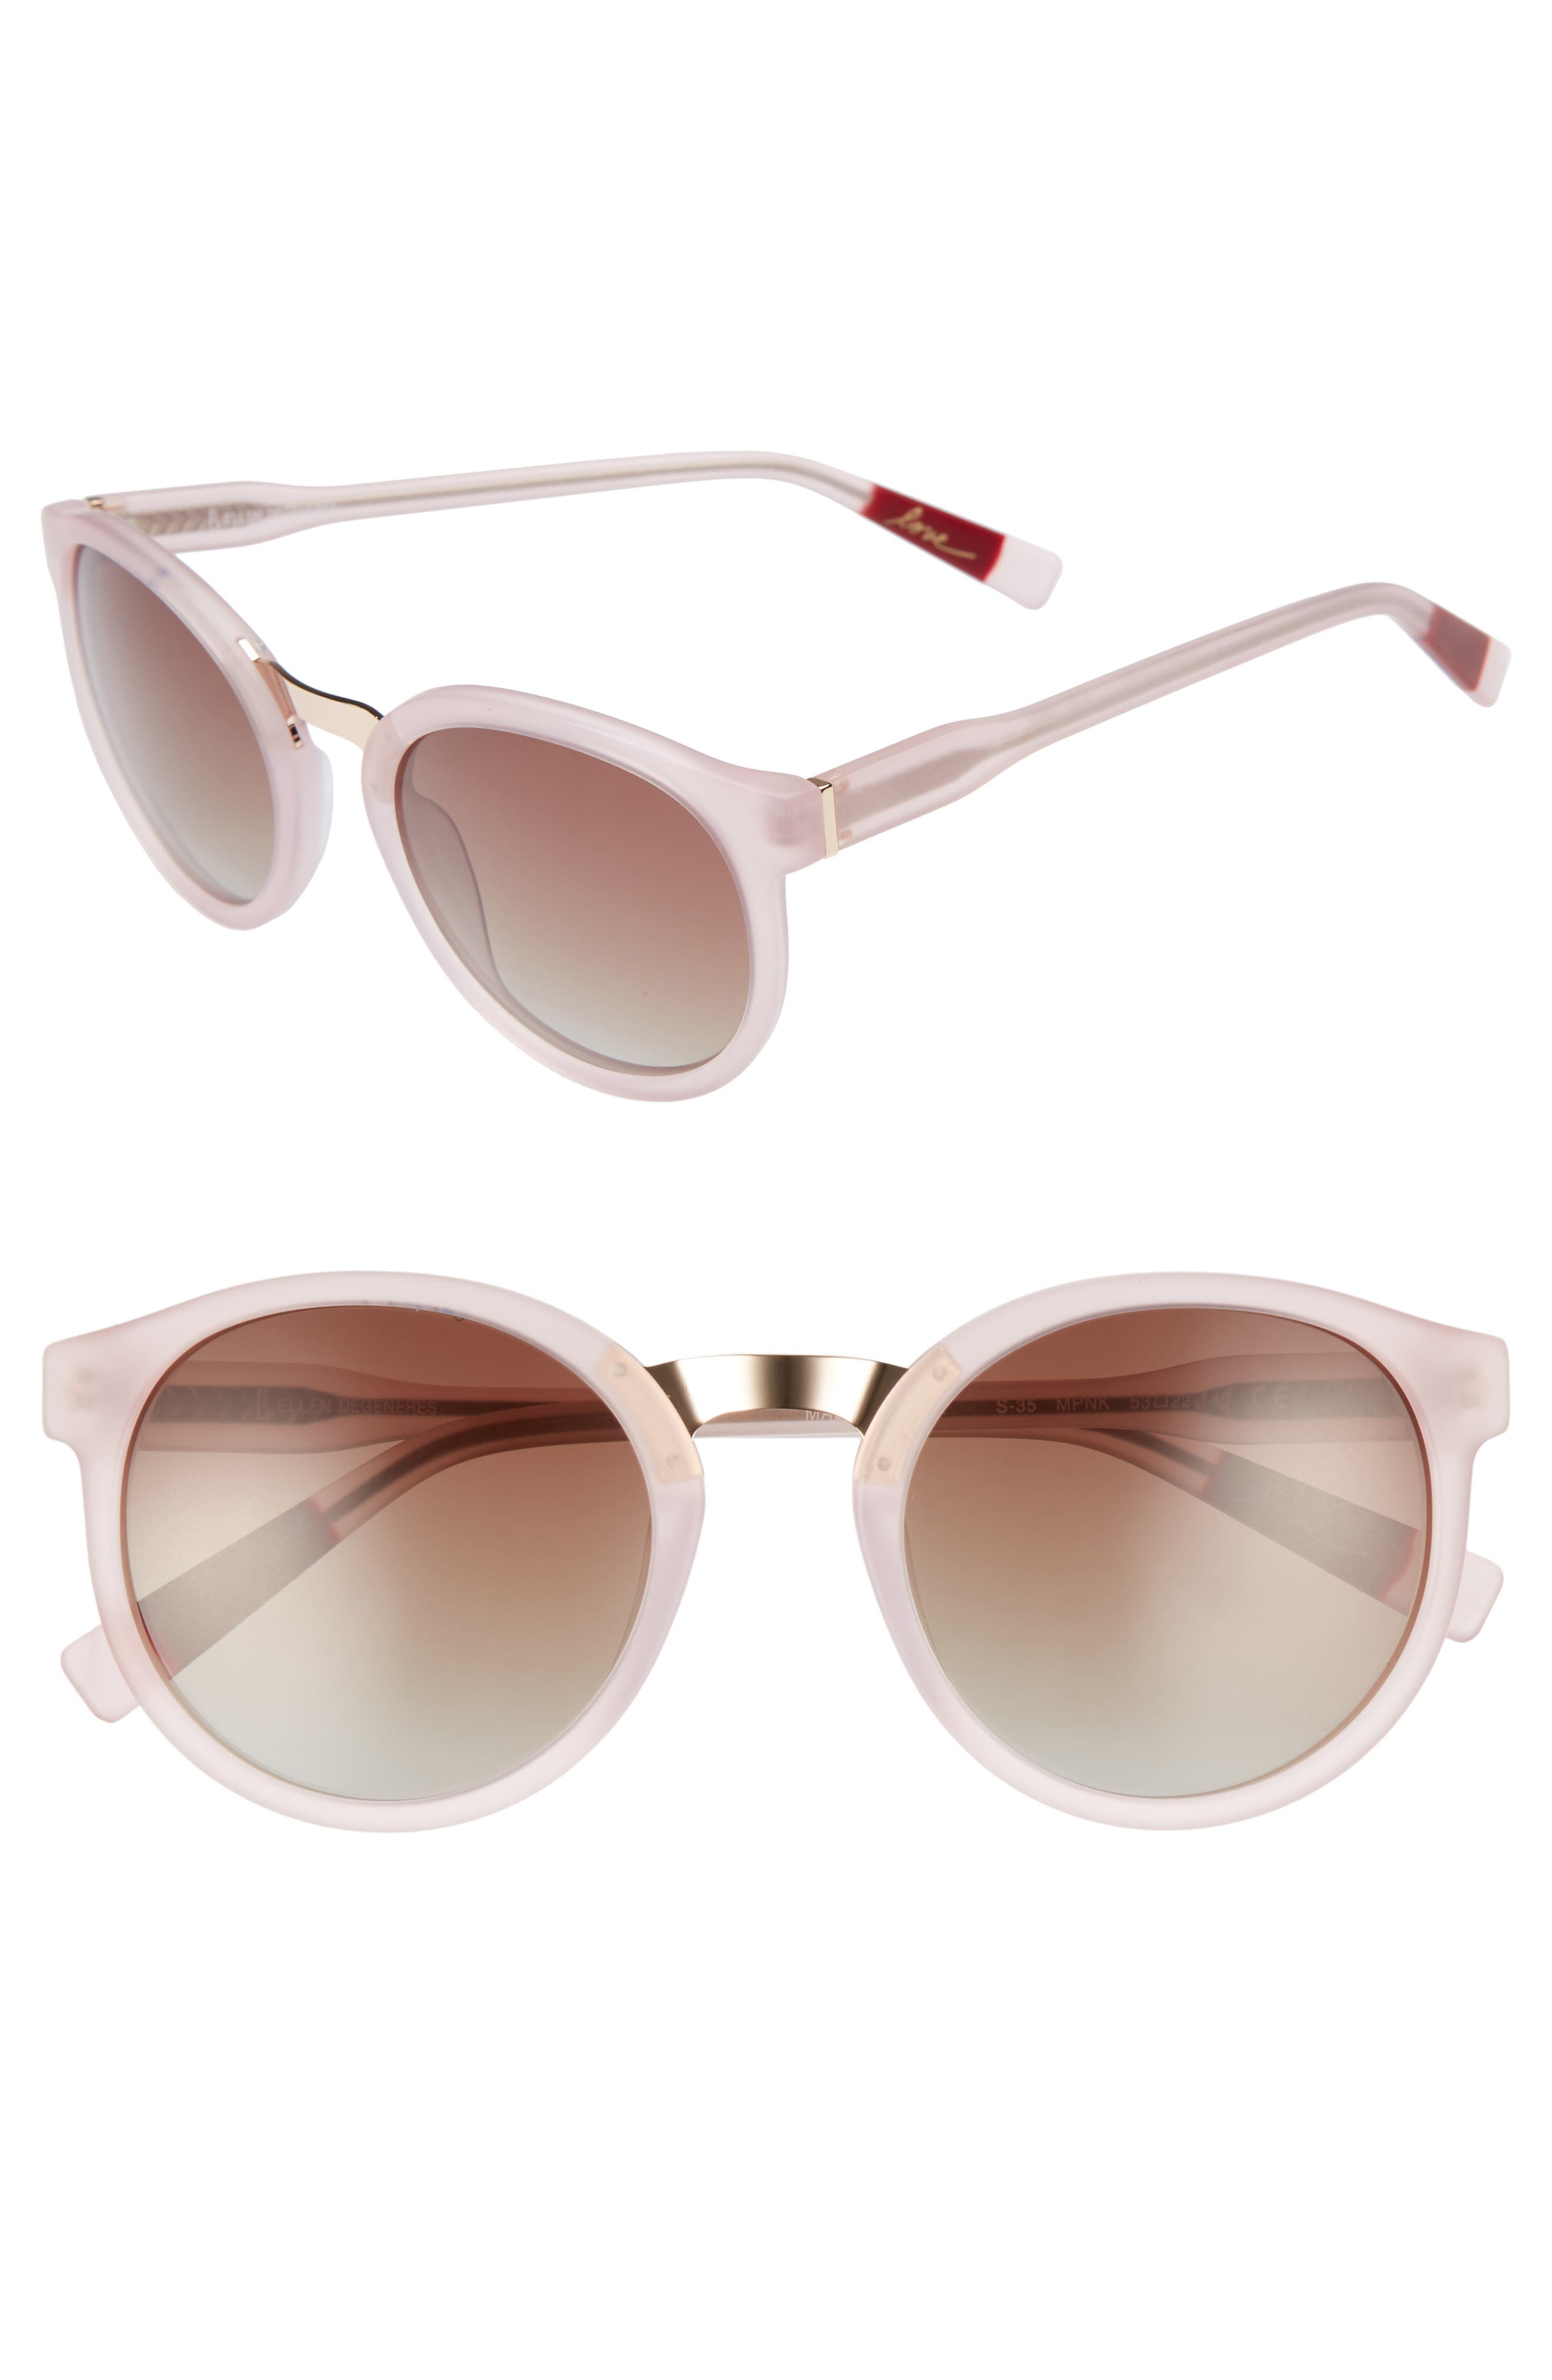 53mm Round Sunglasses,                             Main thumbnail 4, color,